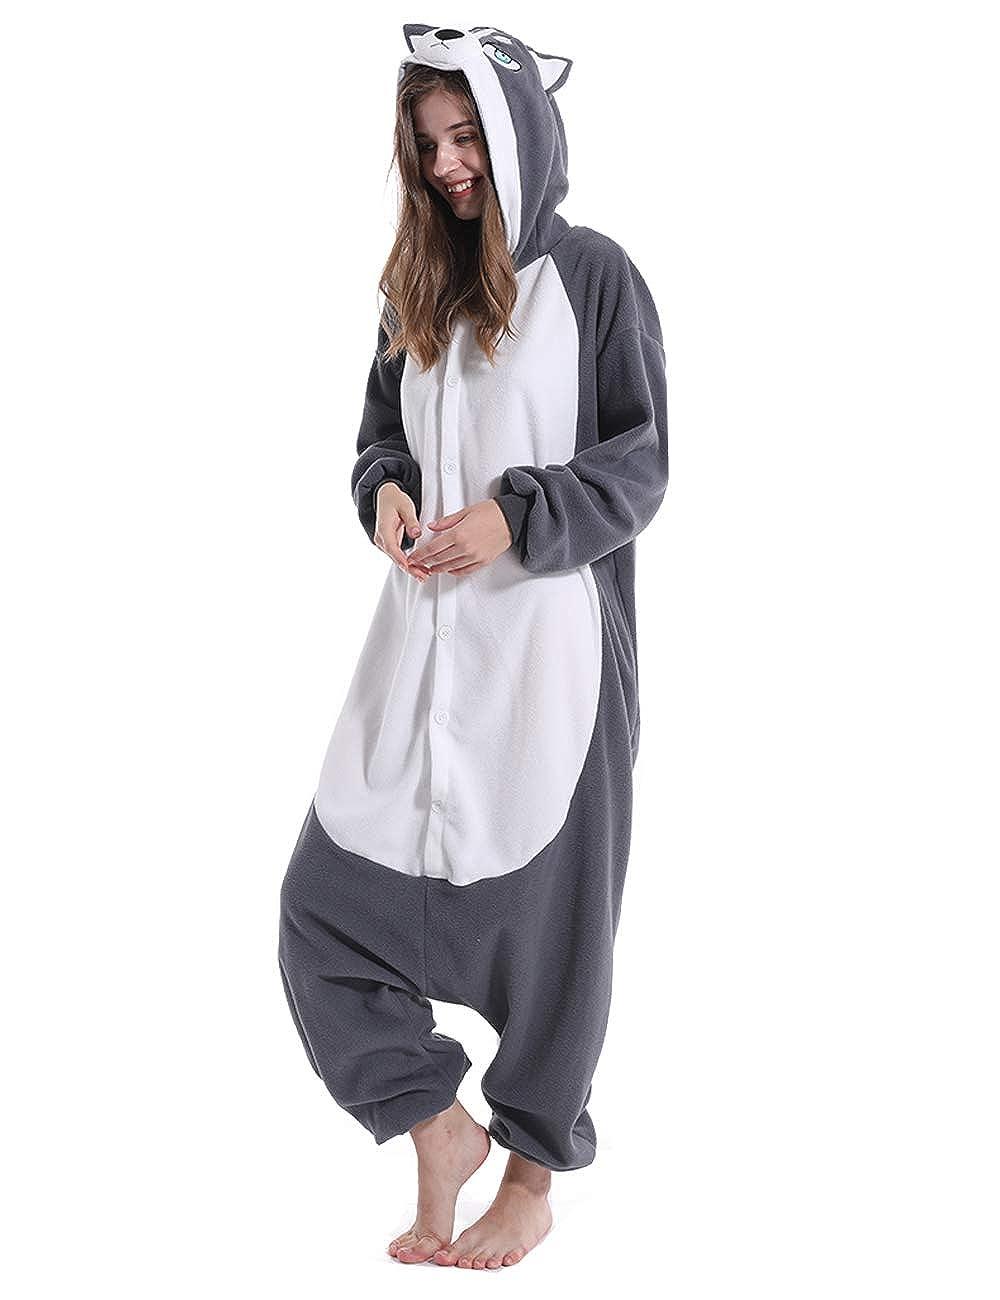 vavalad Adult Husky Dog Onesie Pajamas Cosplay Animal Homewear Sleepwear Jumpsuit Costume Women Men